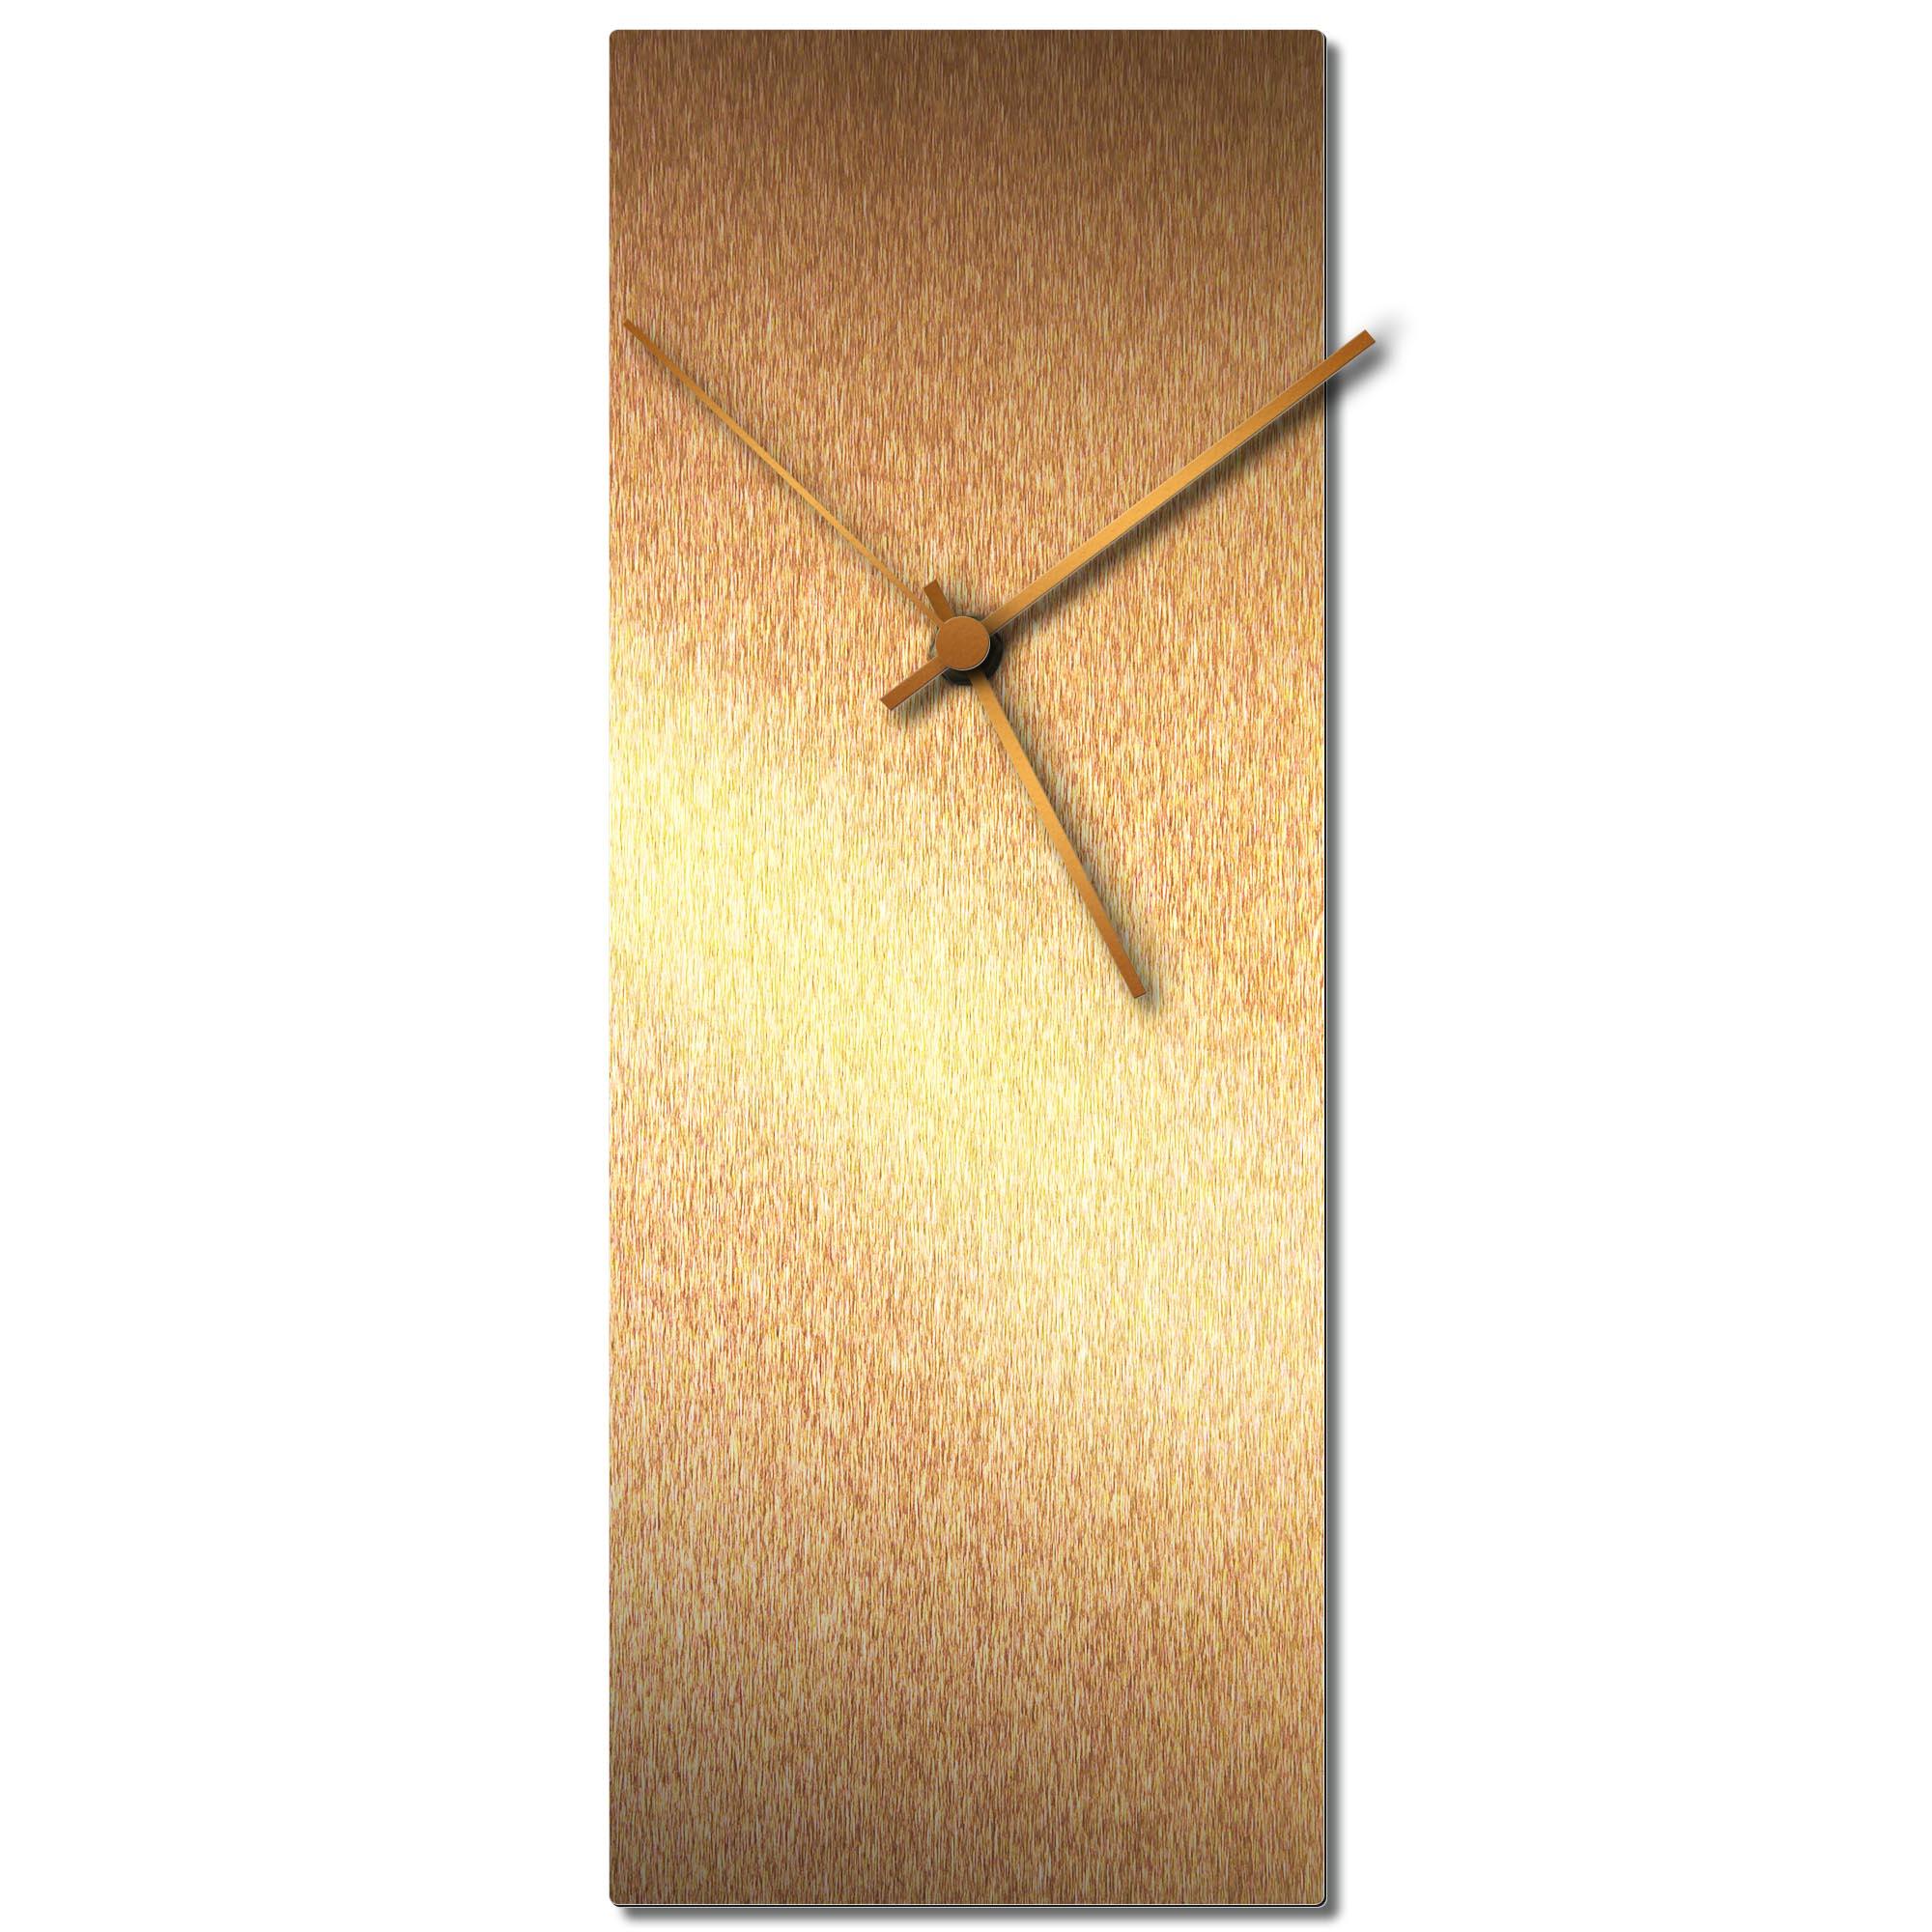 Adam Schwoeppe 'Bronzesmith Clock Large Bronze' Midcentury Modern Style Wall Clock